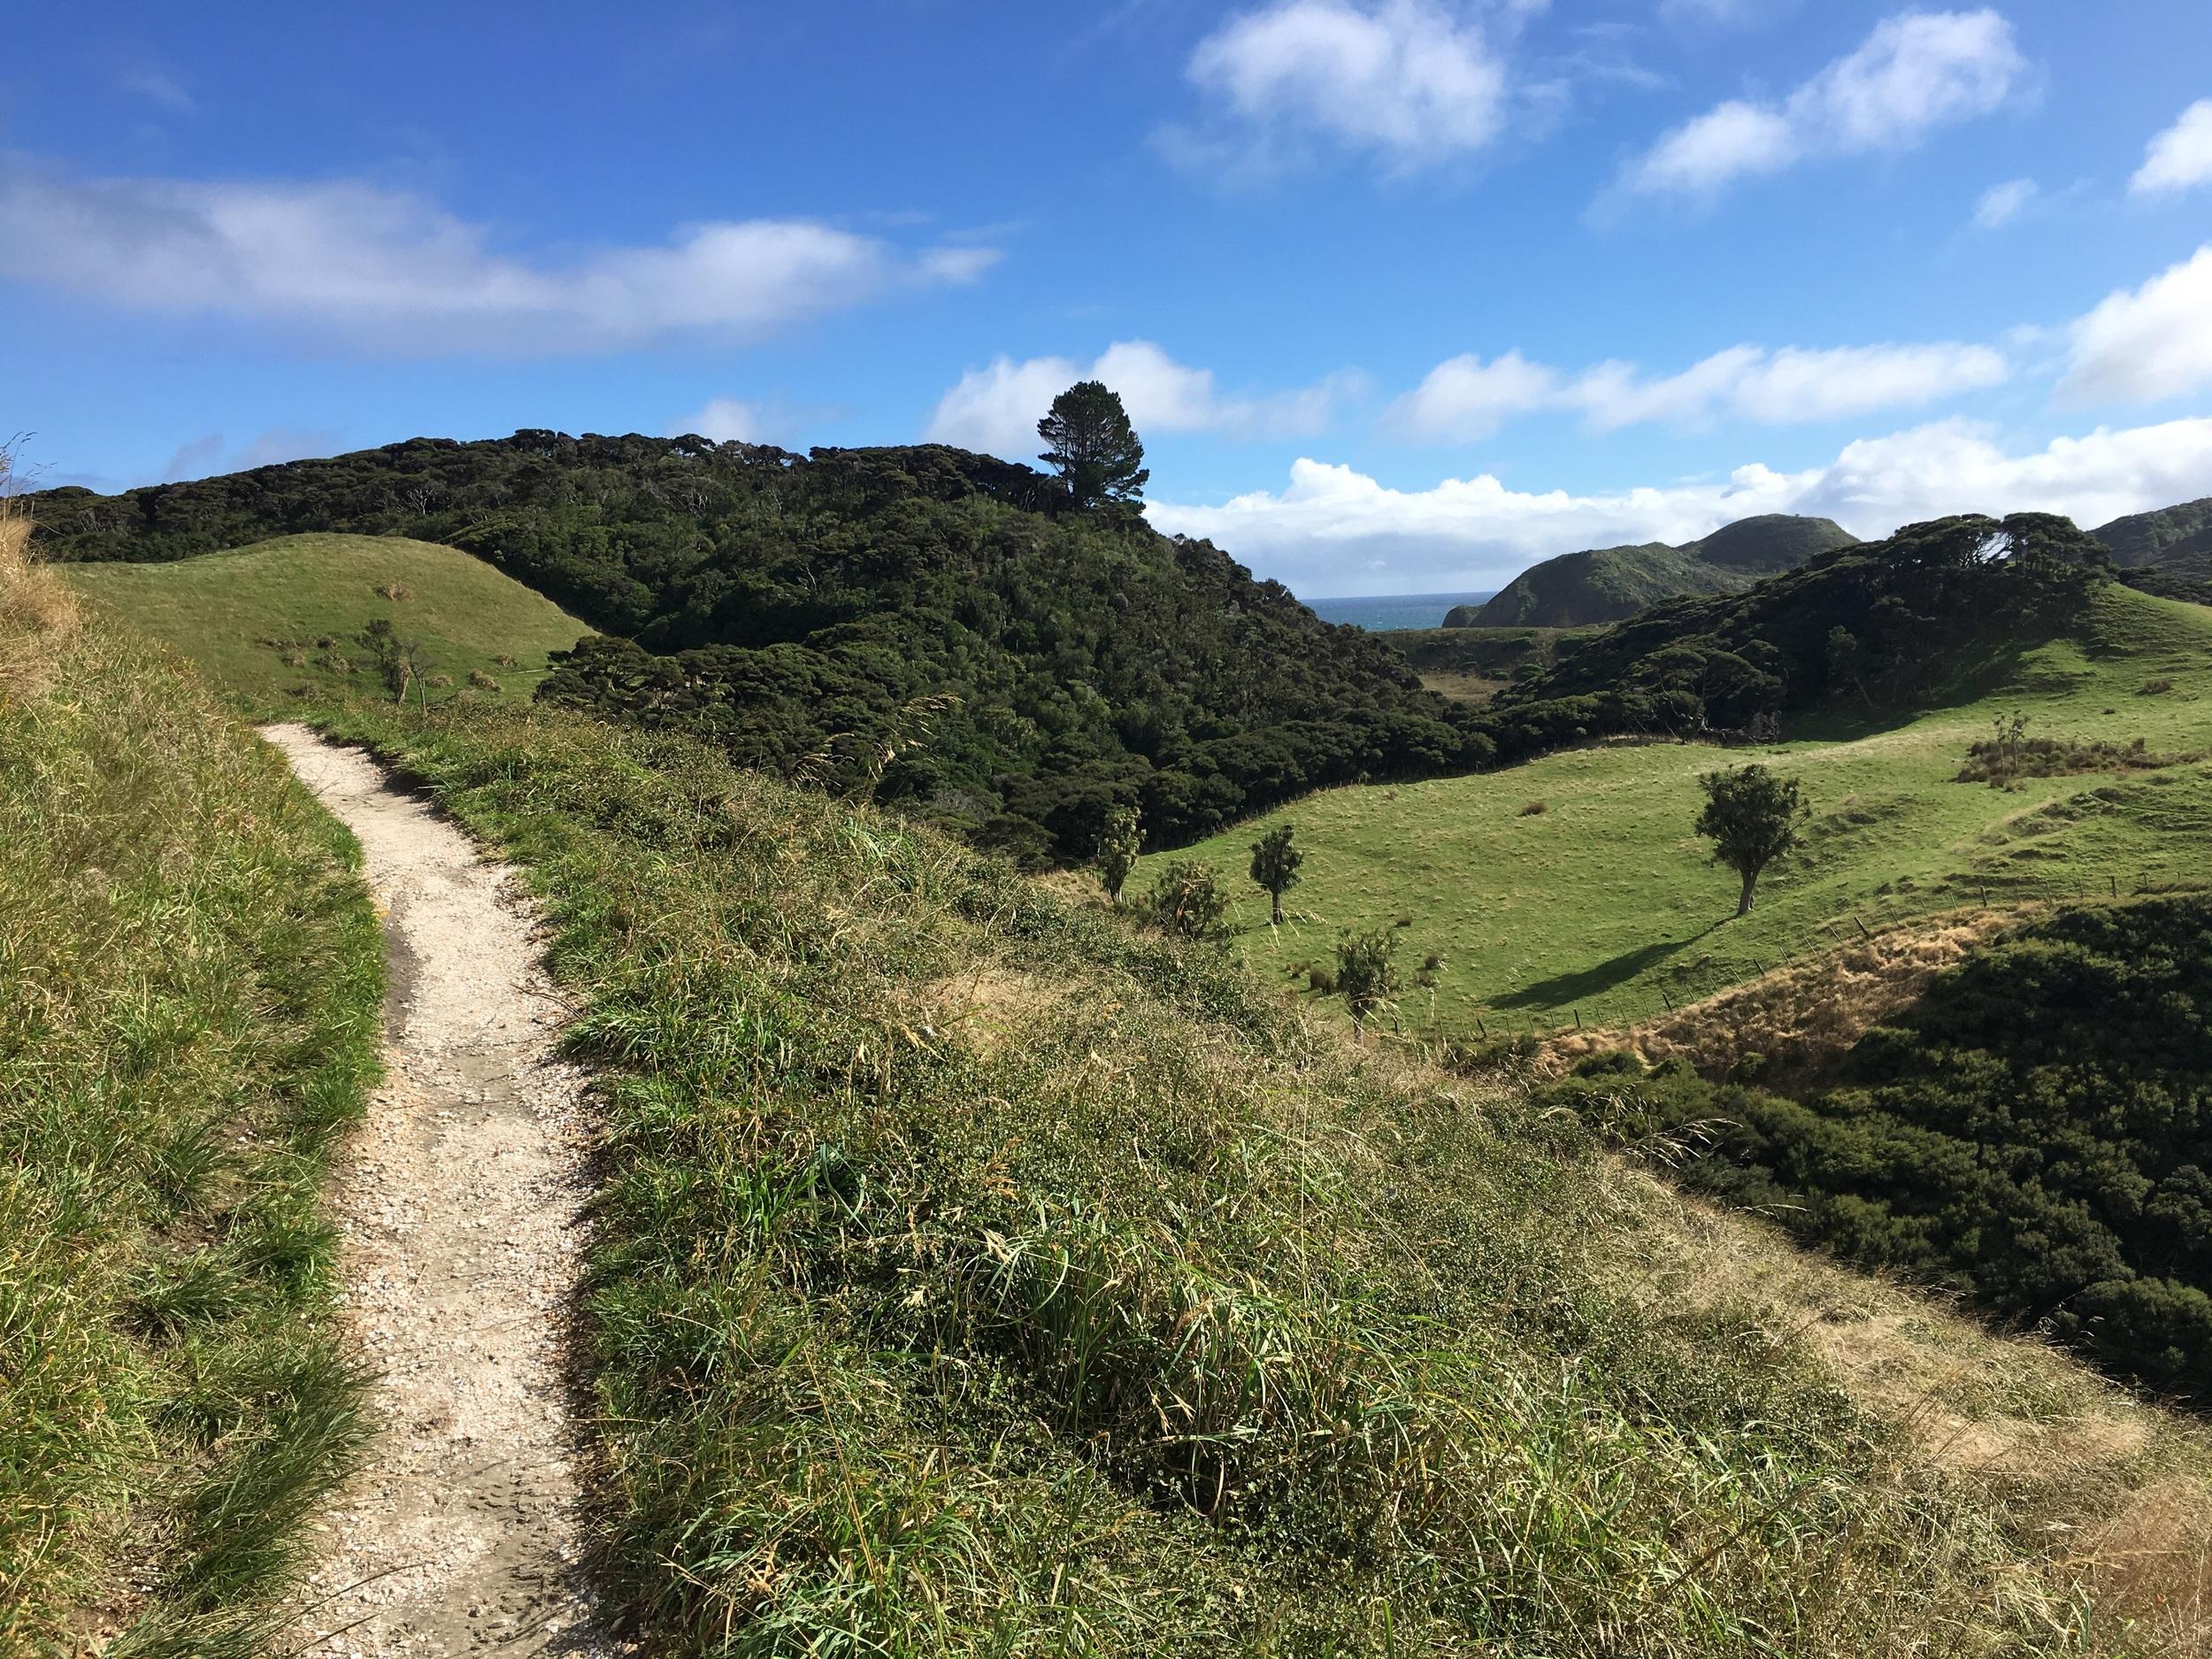 Land of Hobbits, south island